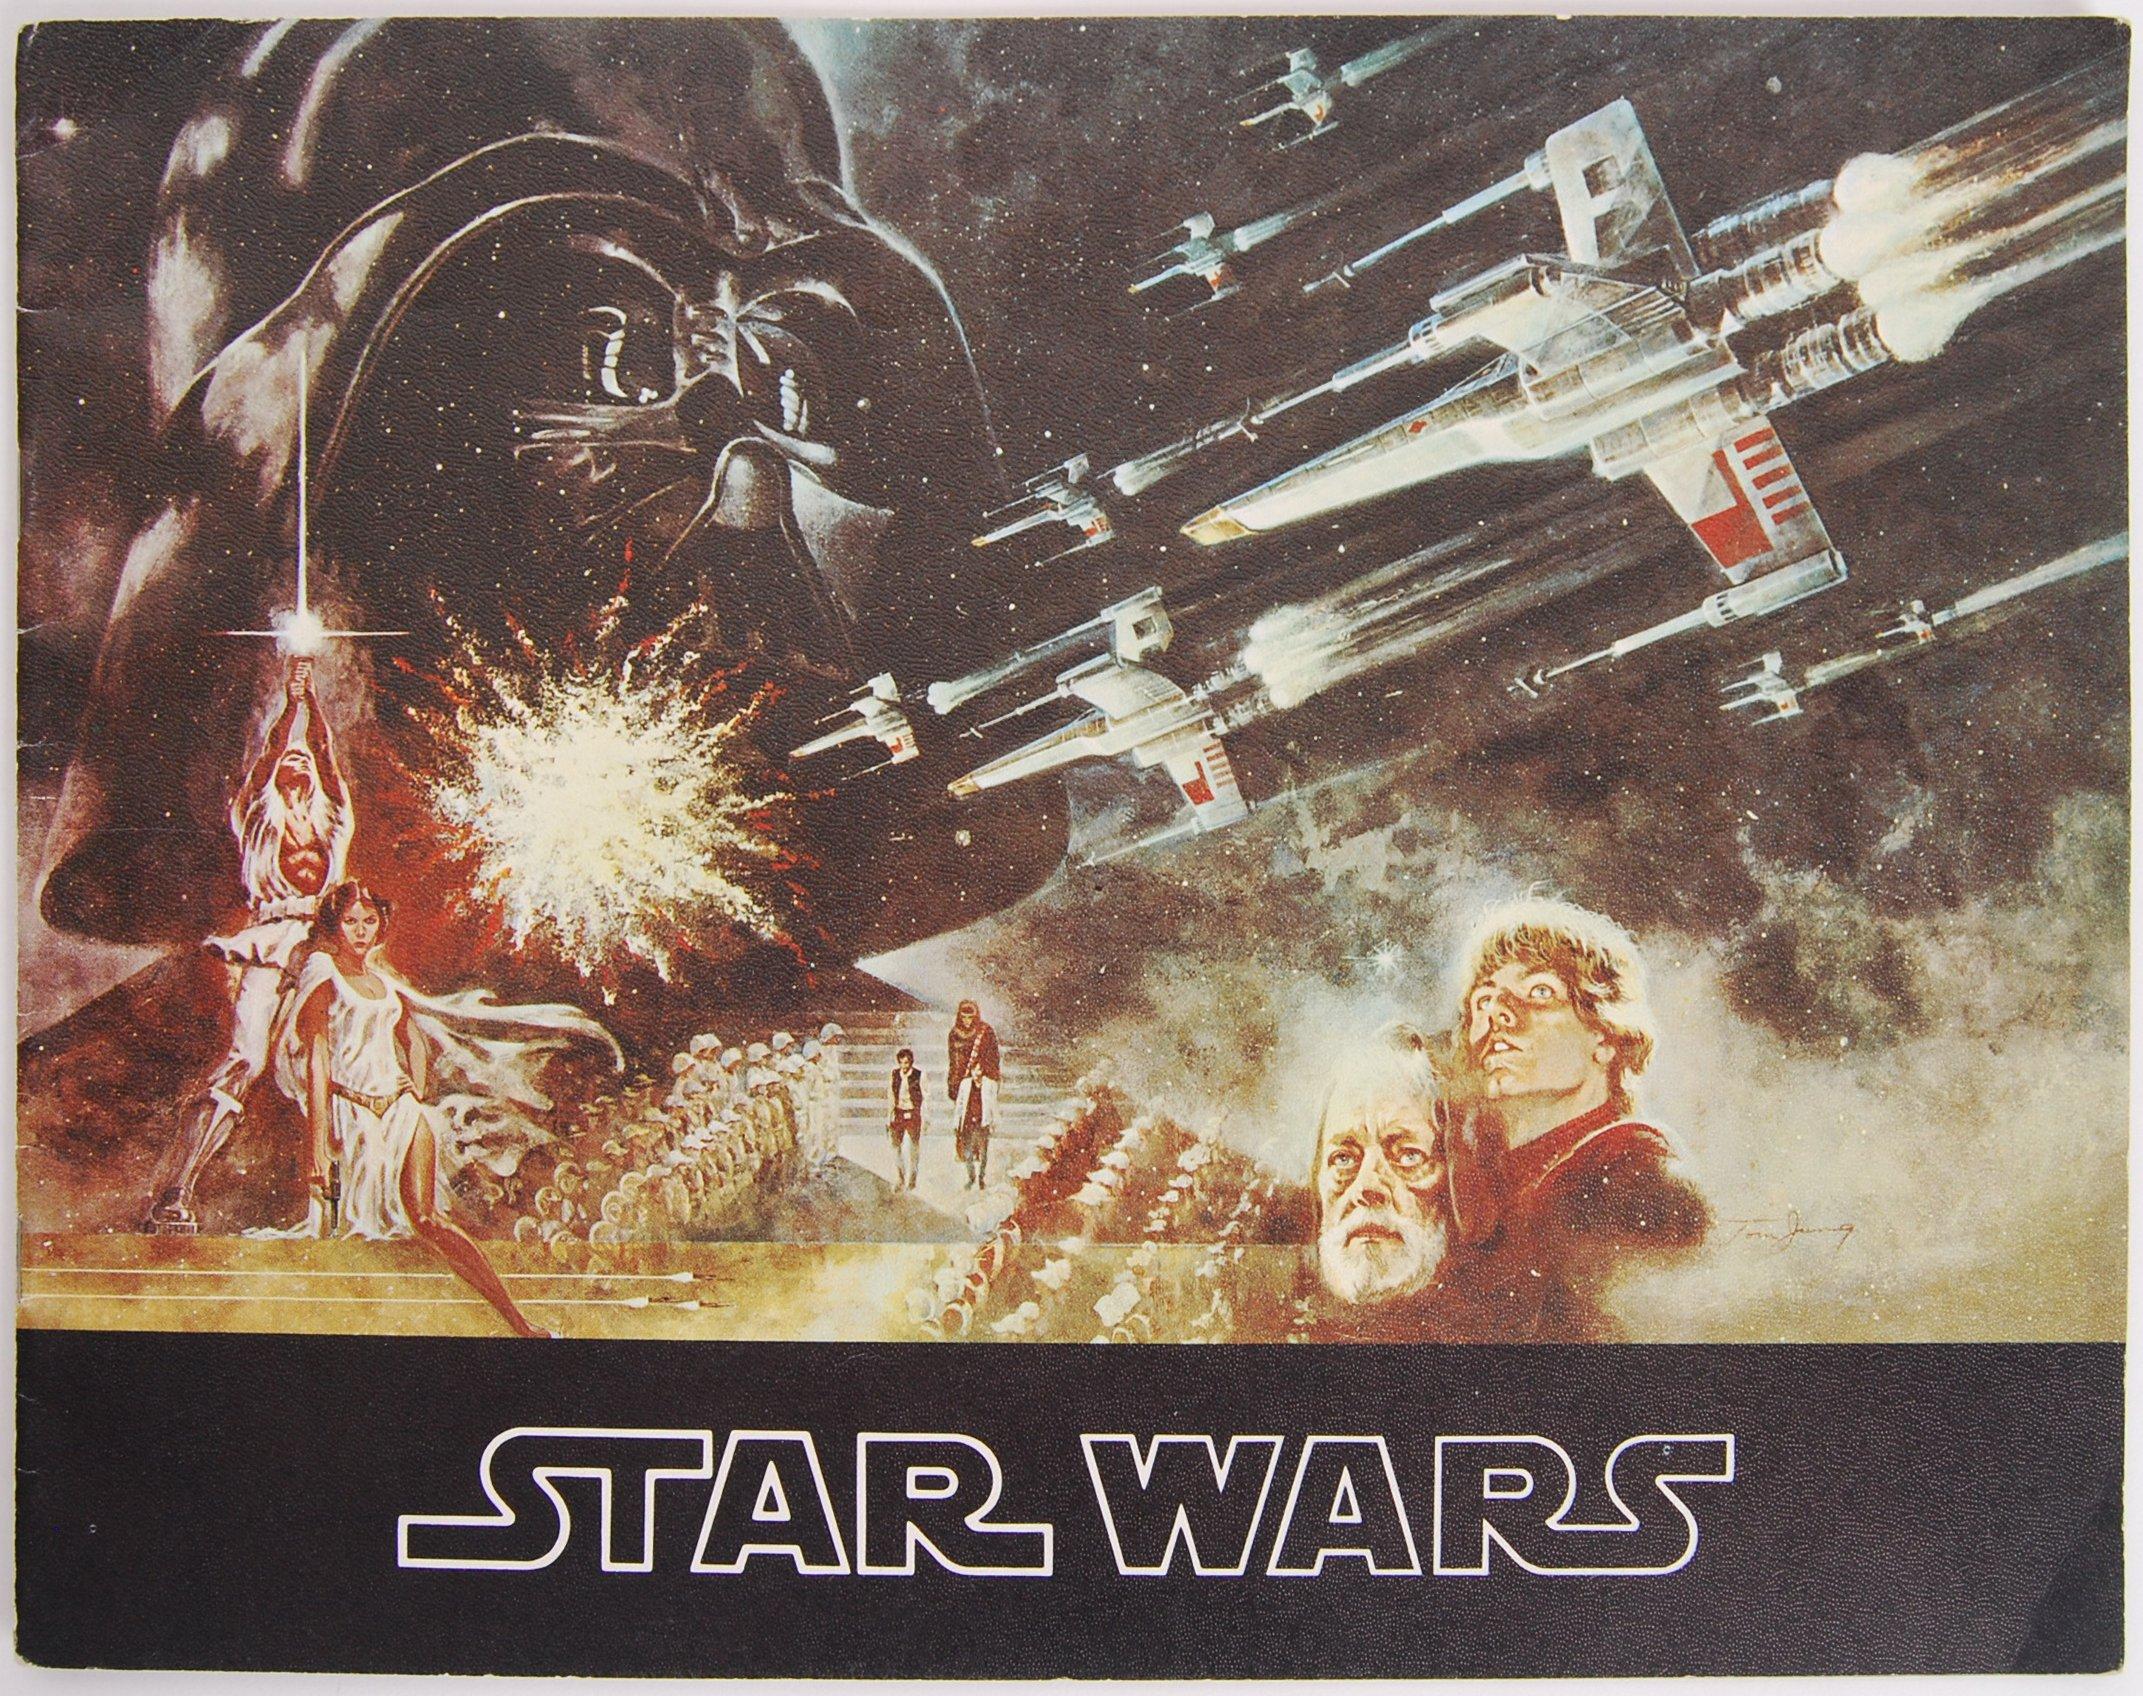 RARE ORIGINAL 1977 STAR WARS UK CINEMA RELEASE BRO